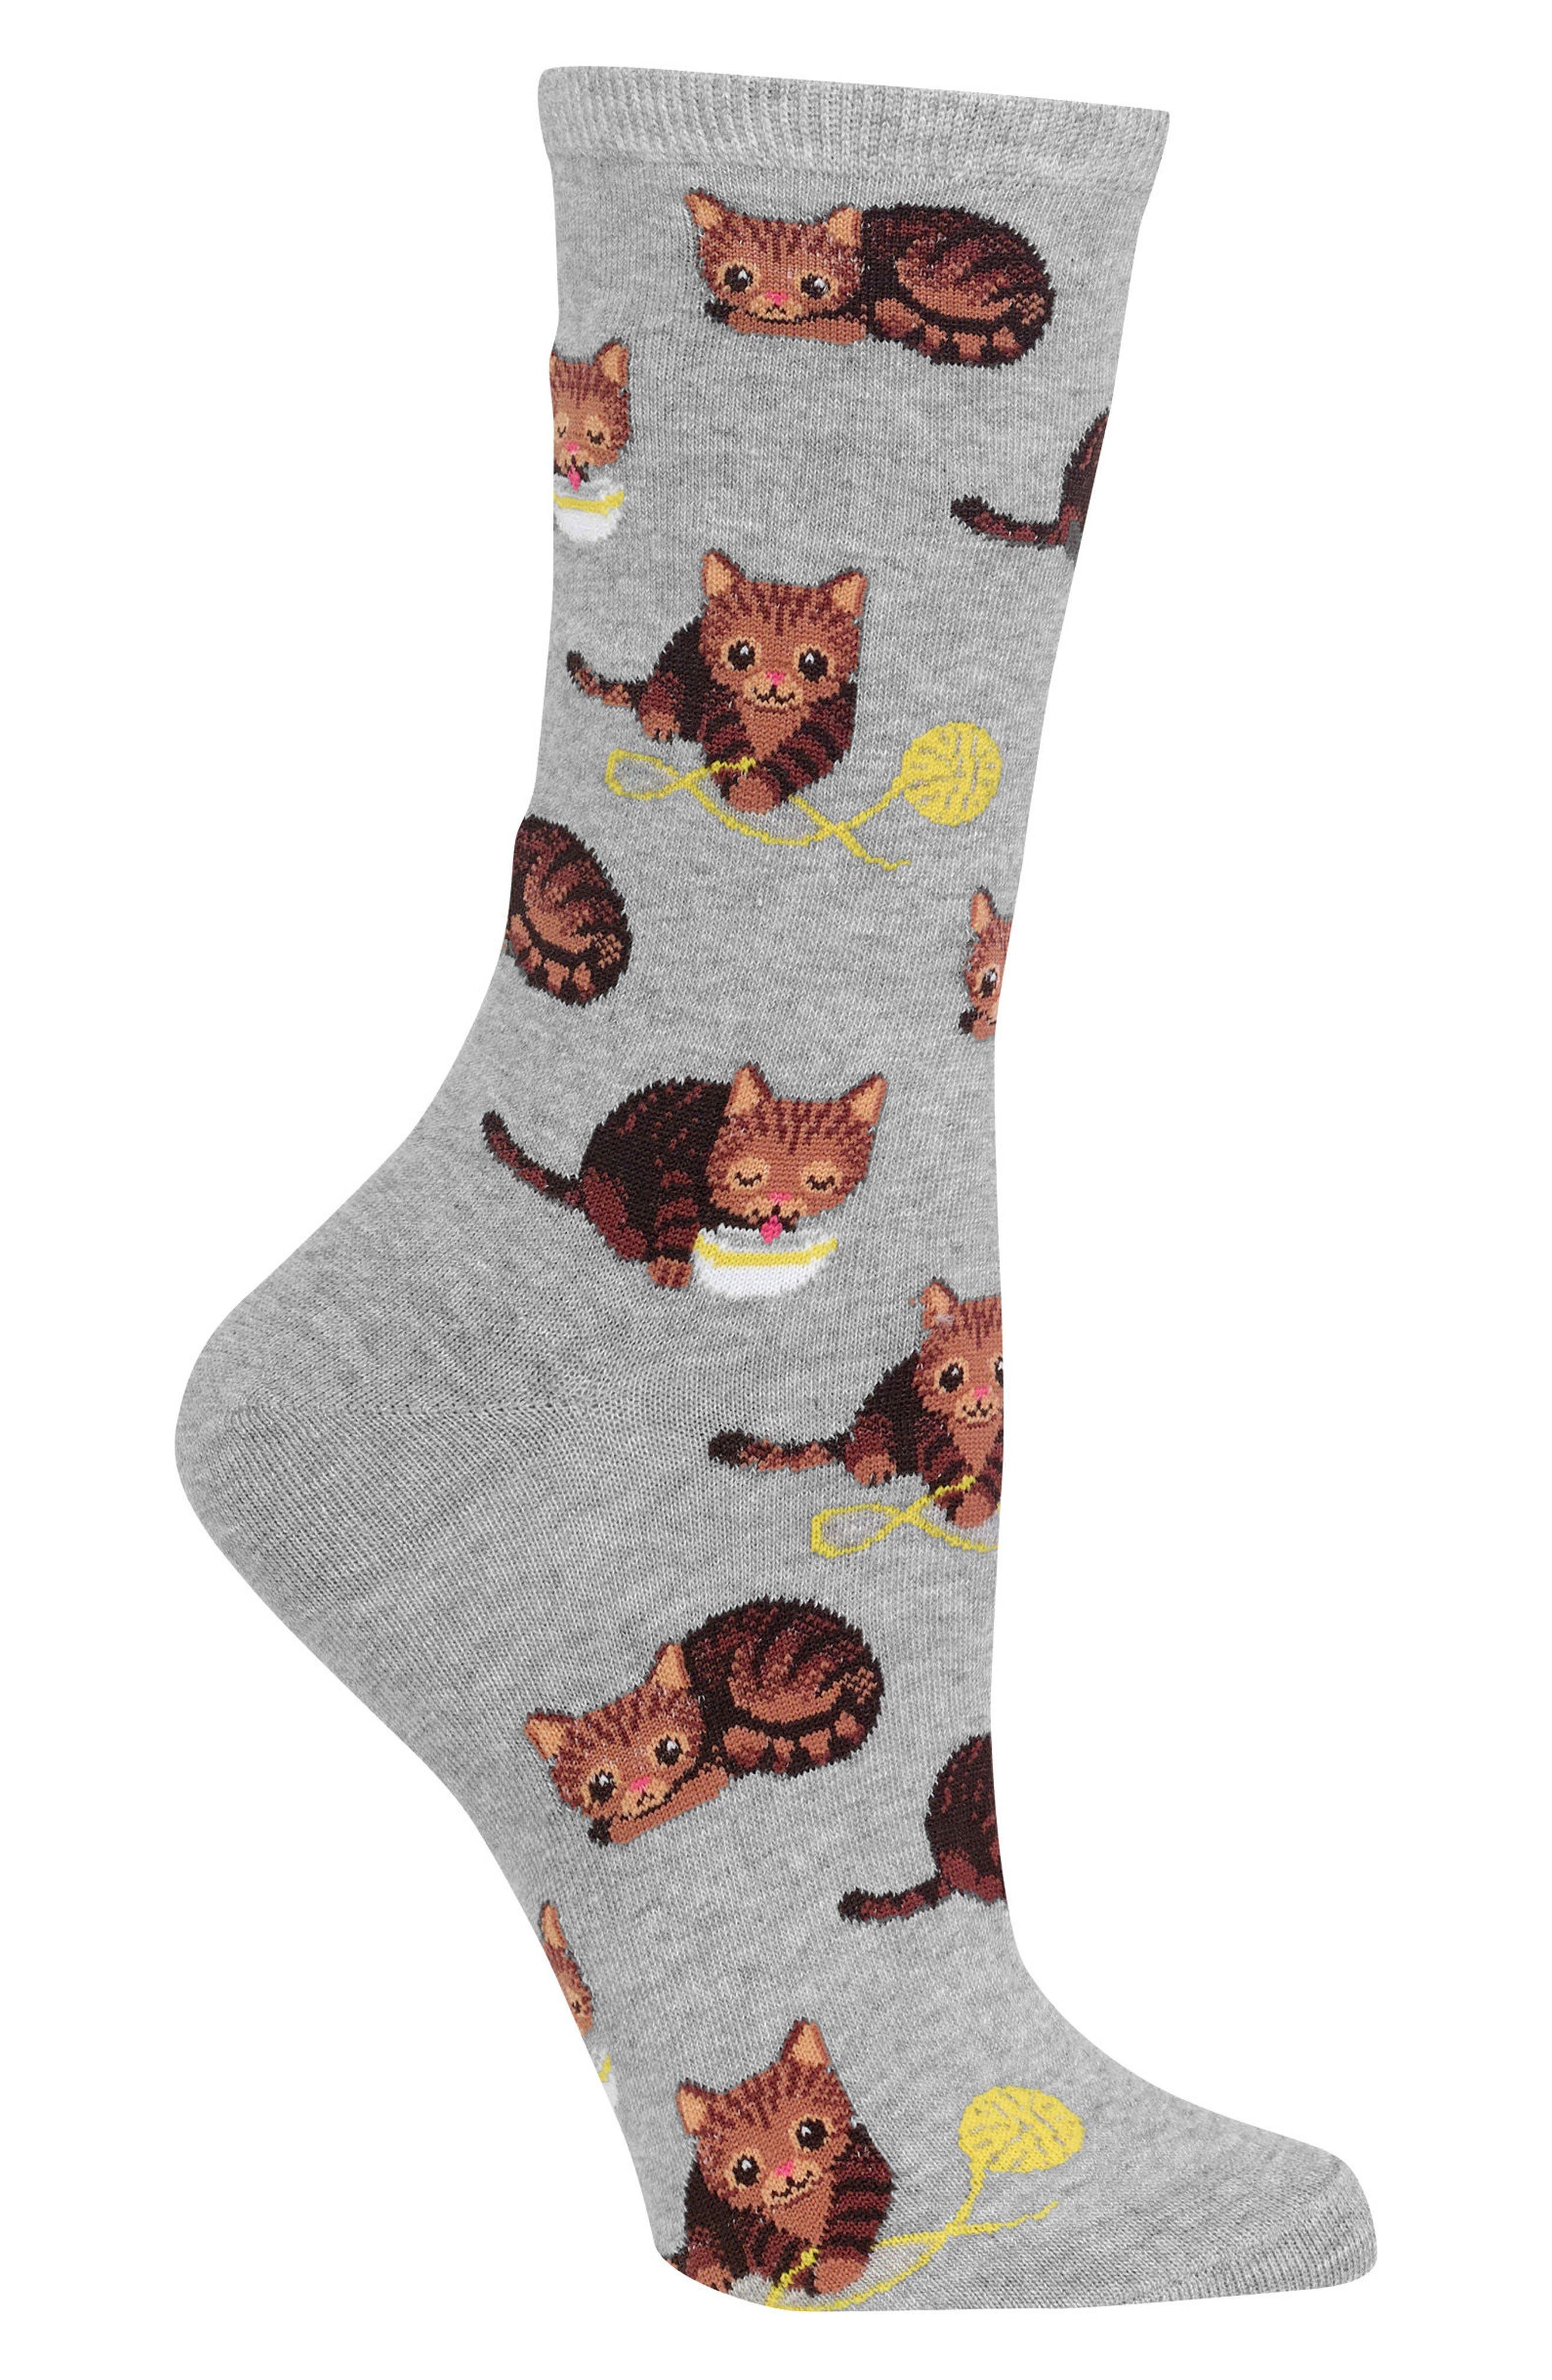 Cat & Yarn Crew Socks,                             Alternate thumbnail 2, color,                             051